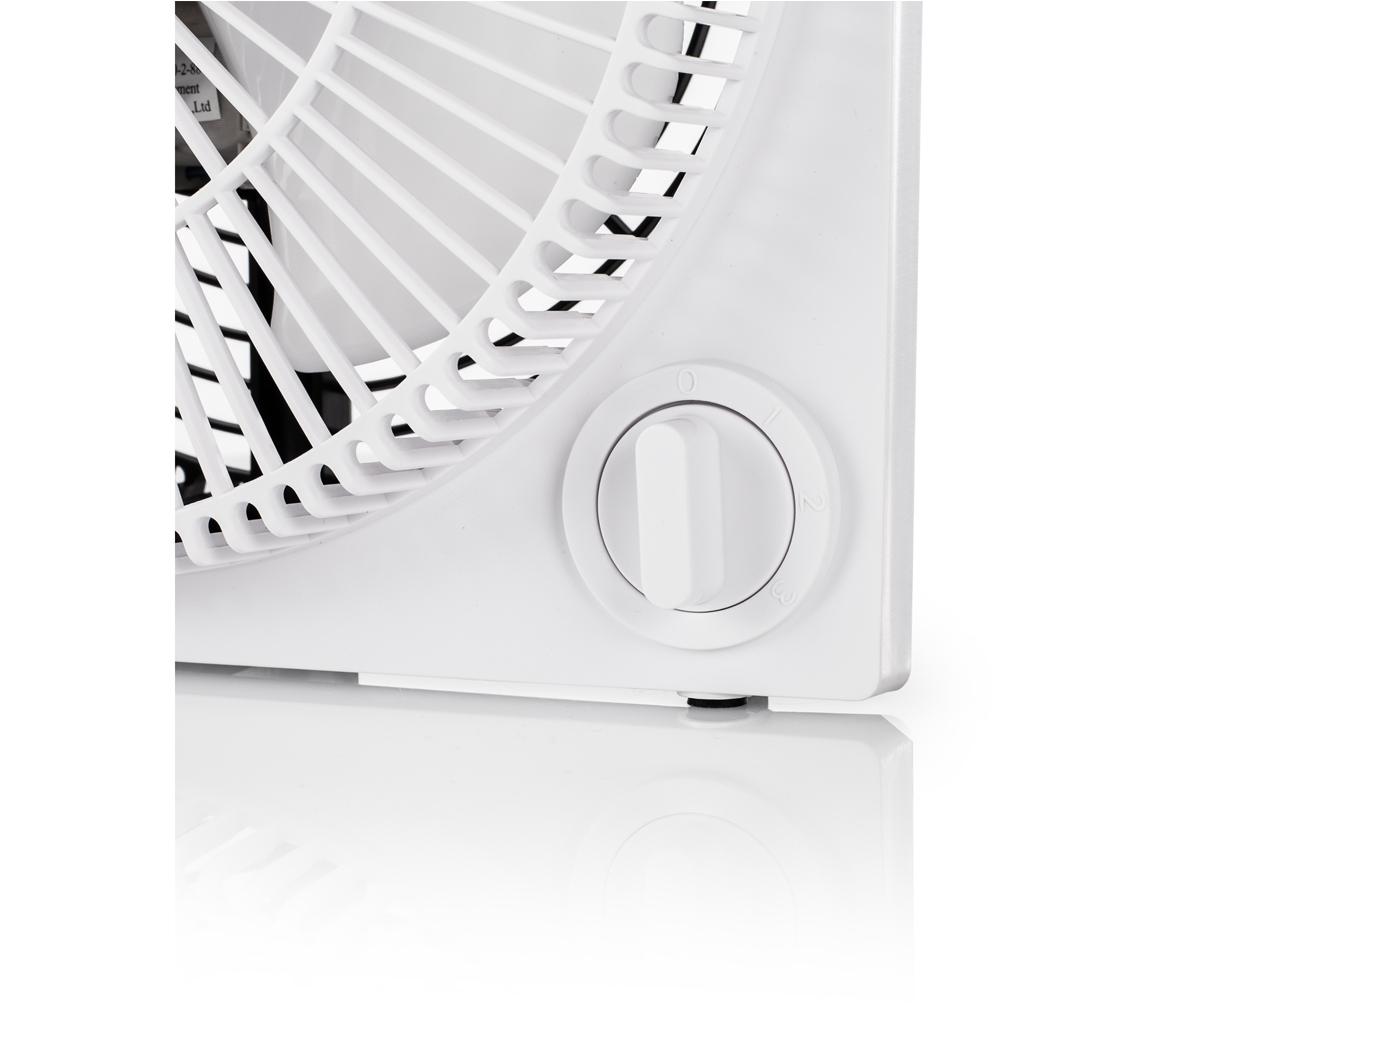 ventilator box 3 stufen 34 watt eckig wei leise. Black Bedroom Furniture Sets. Home Design Ideas